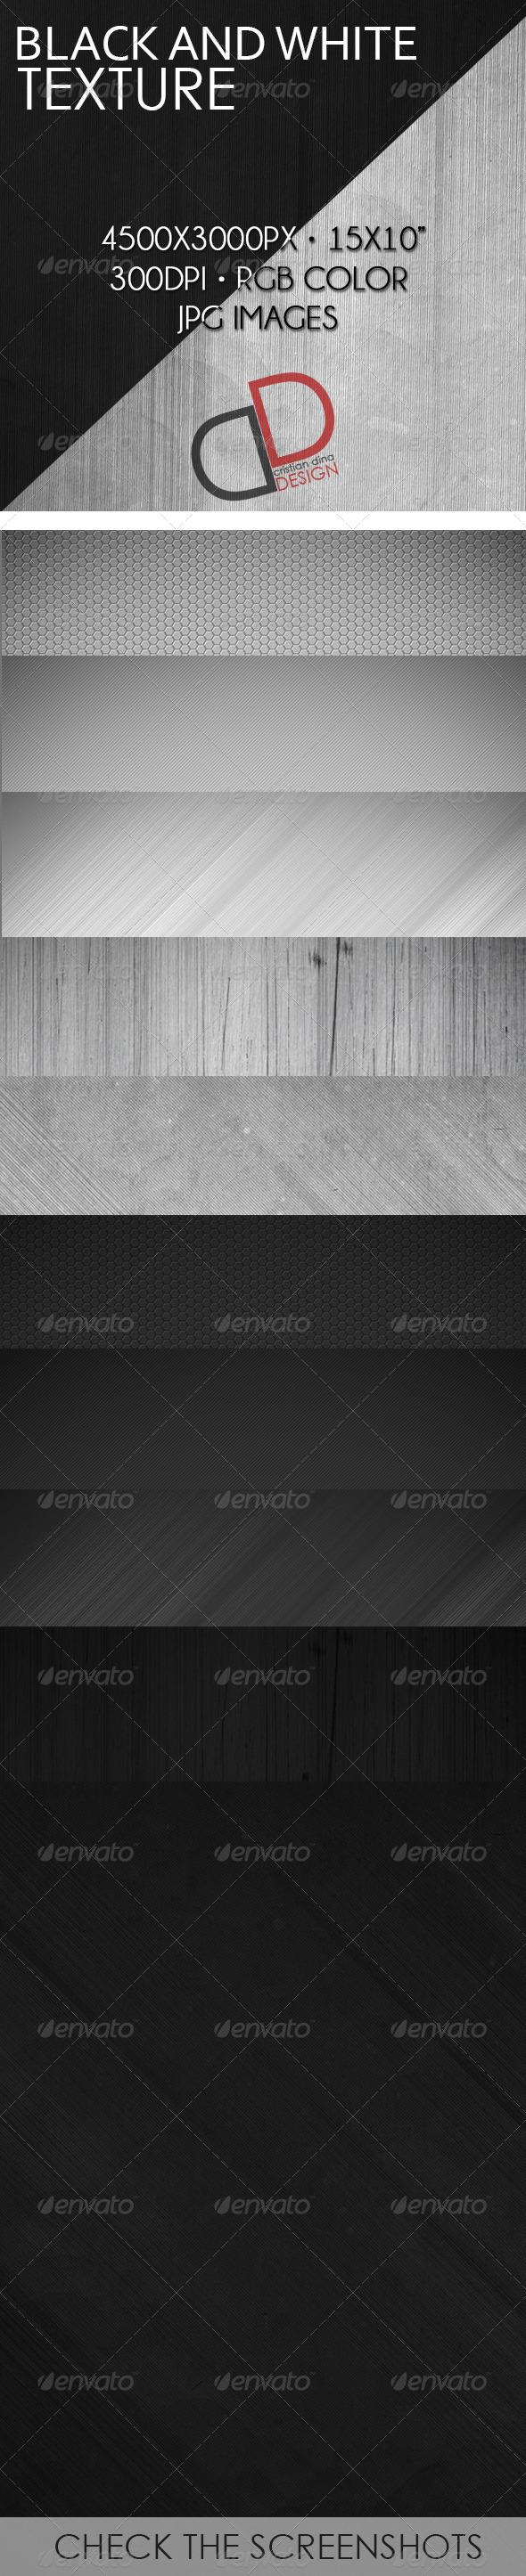 Black and White Texture - Miscellaneous Textures